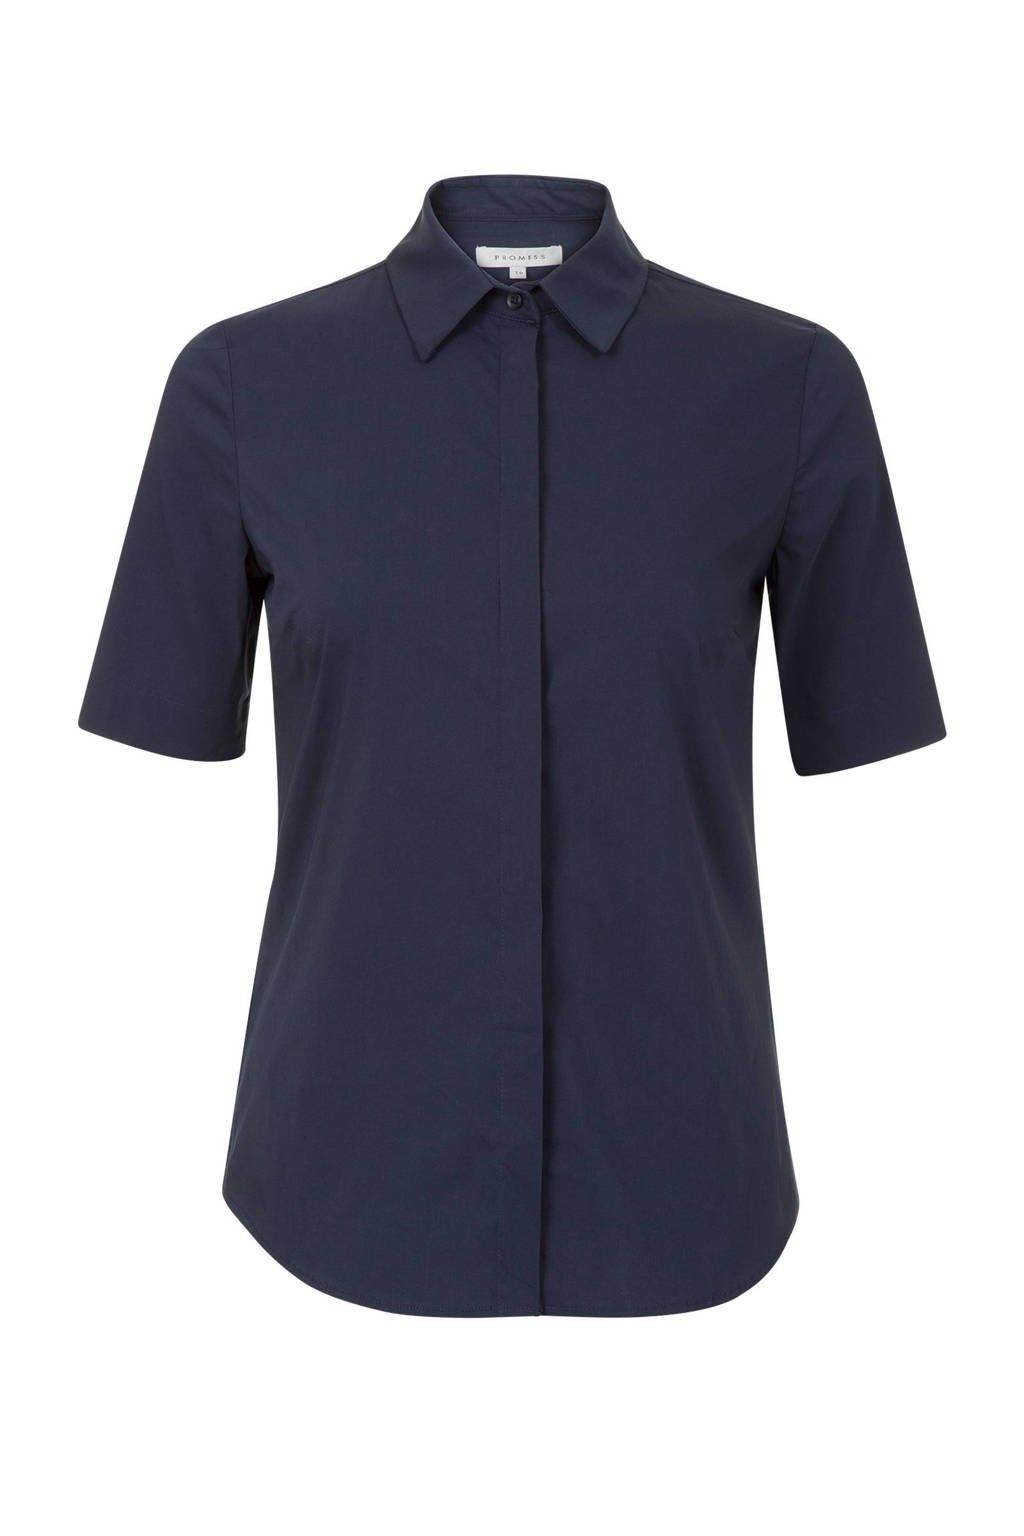 Promiss blouse donkerblauw, Donkerblauw